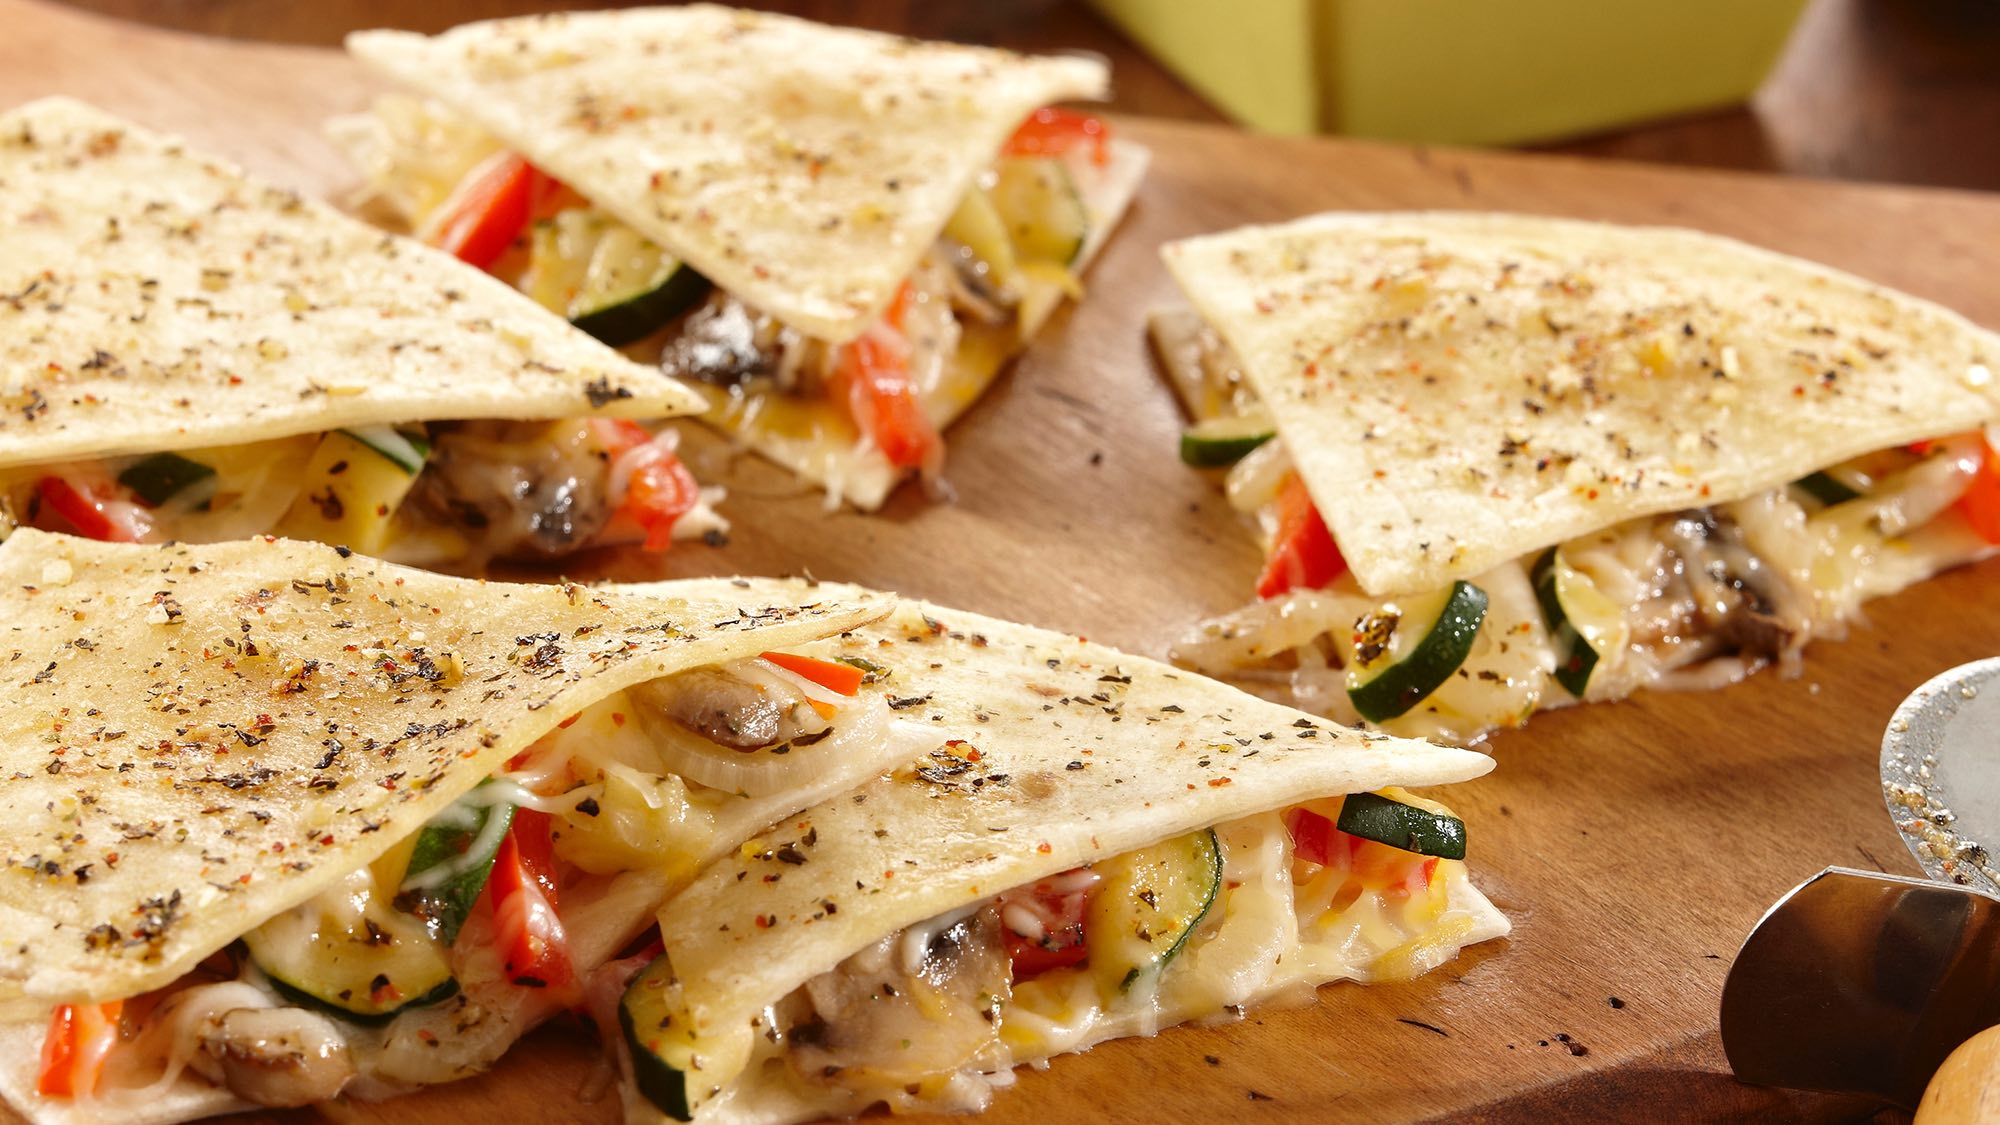 Easy Vegetable Quesadillas